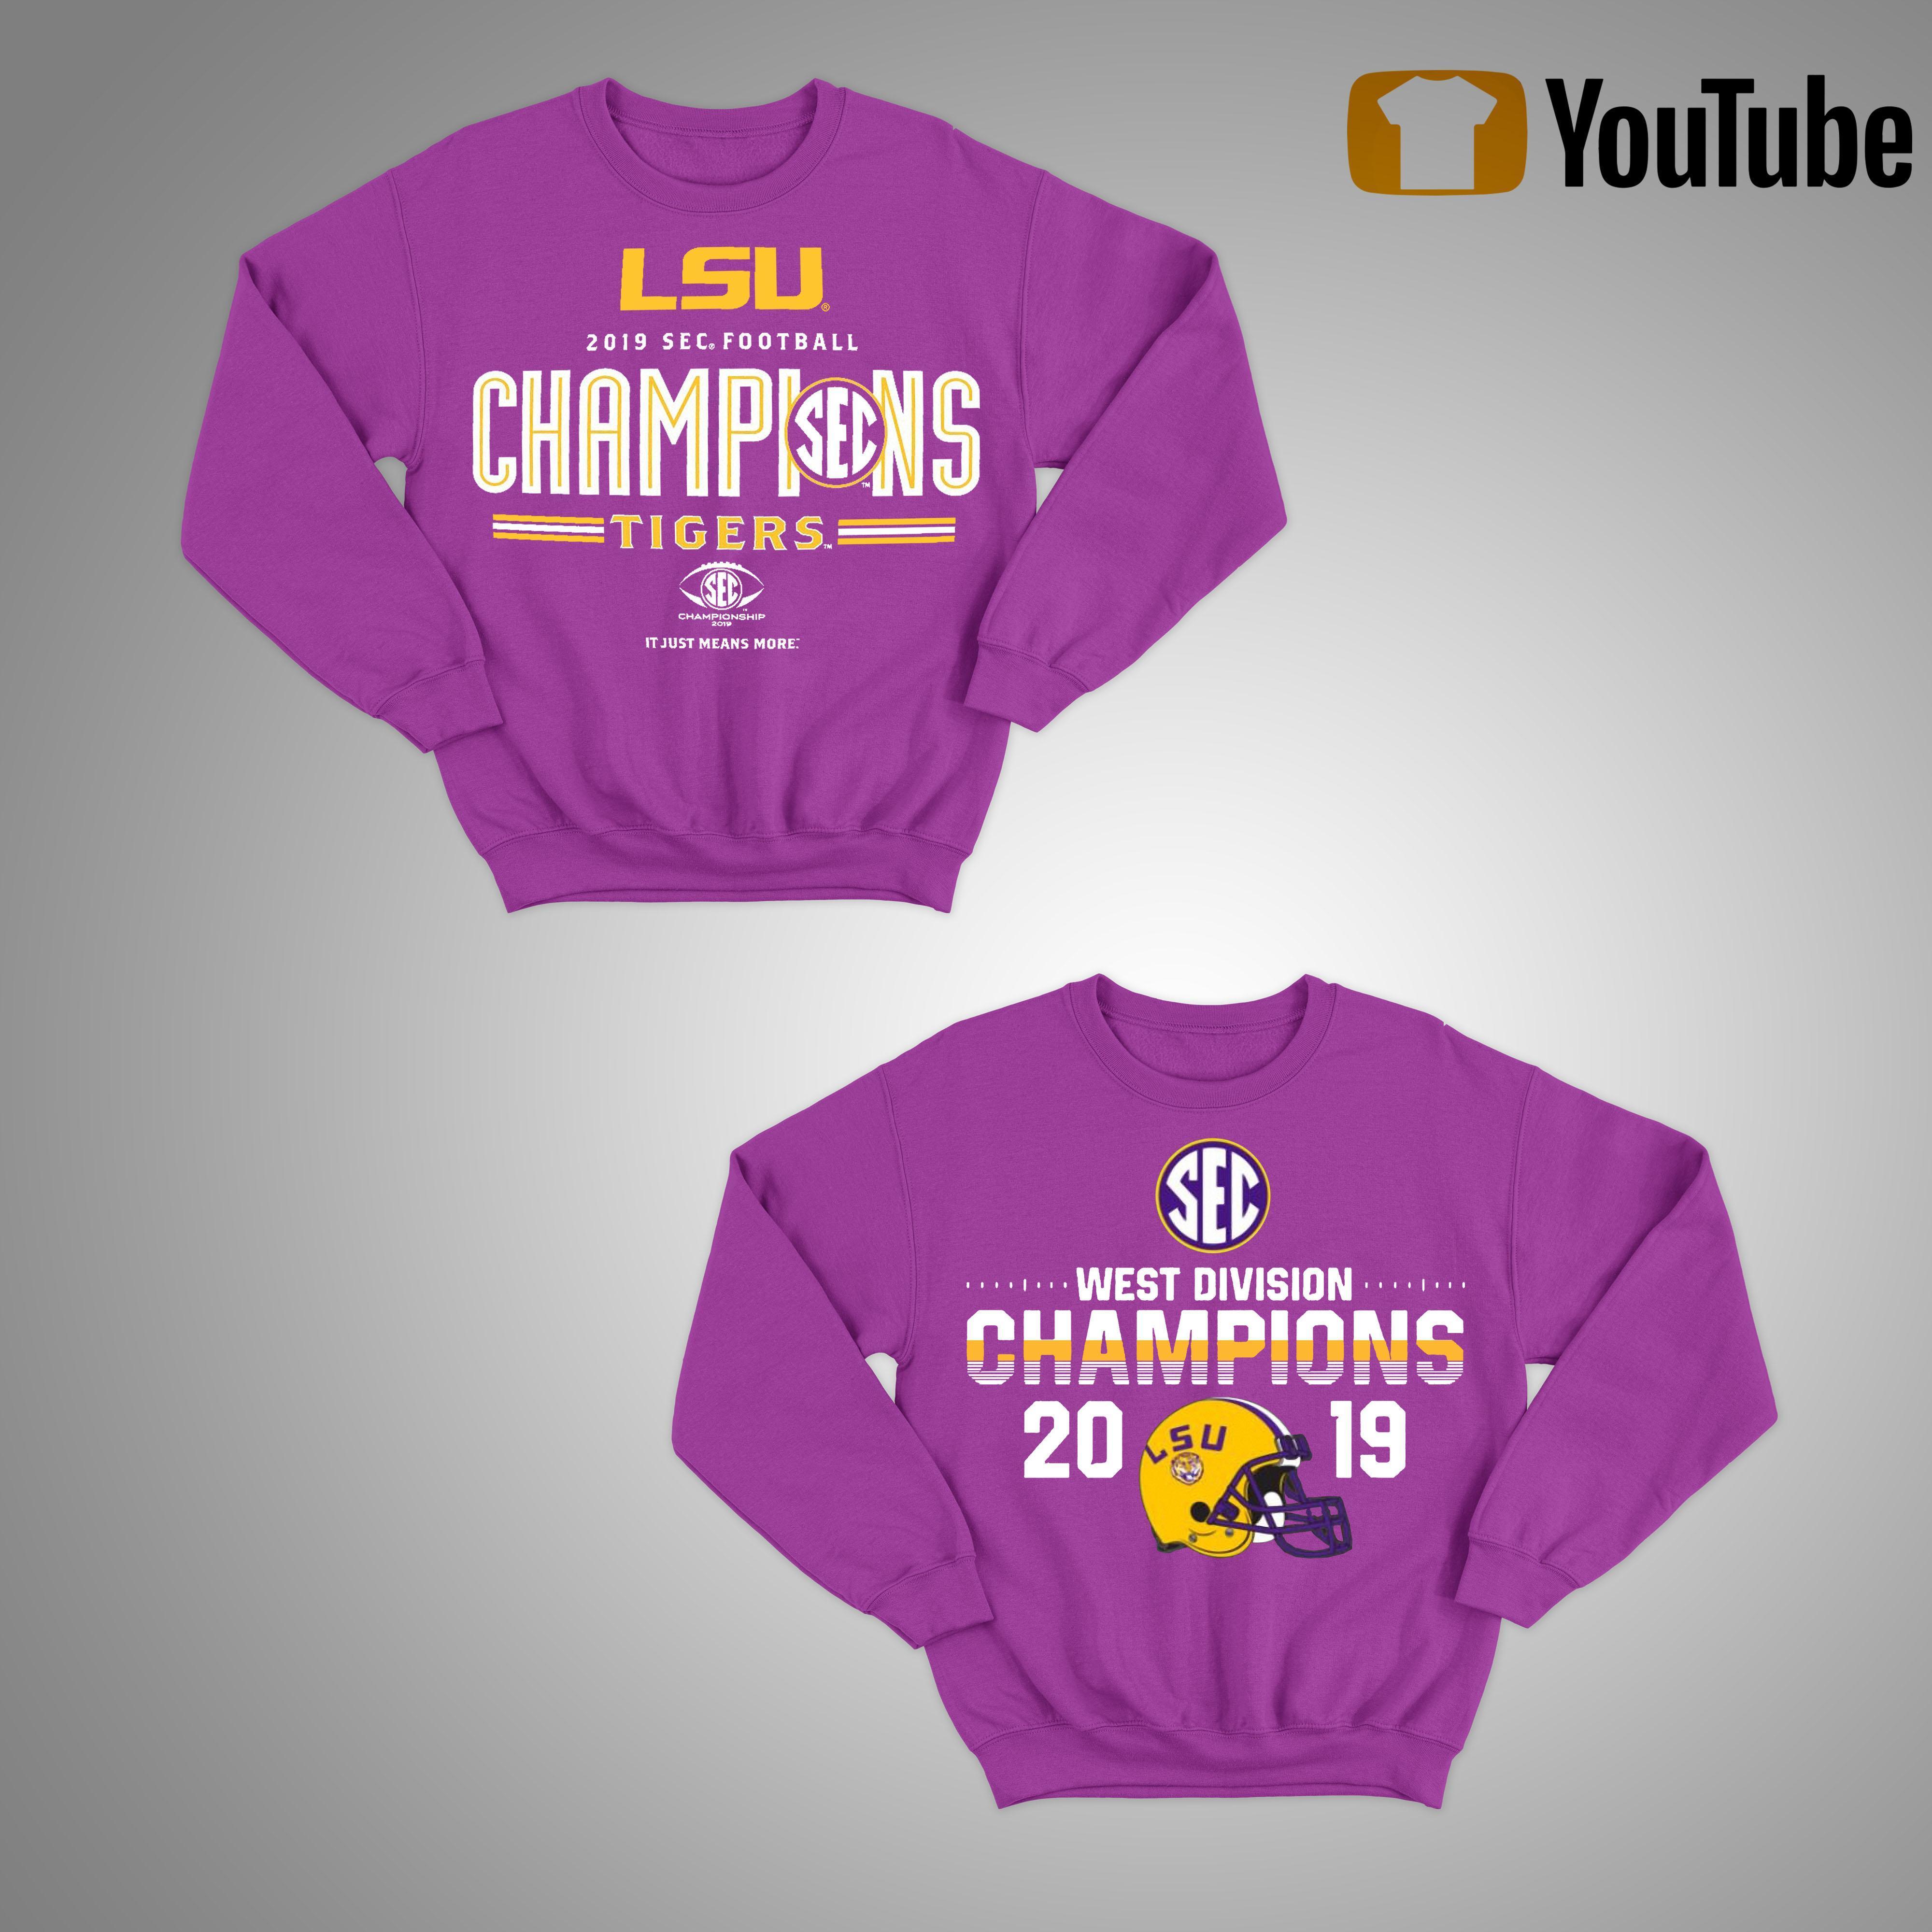 Lsu Sec Championship Sweater